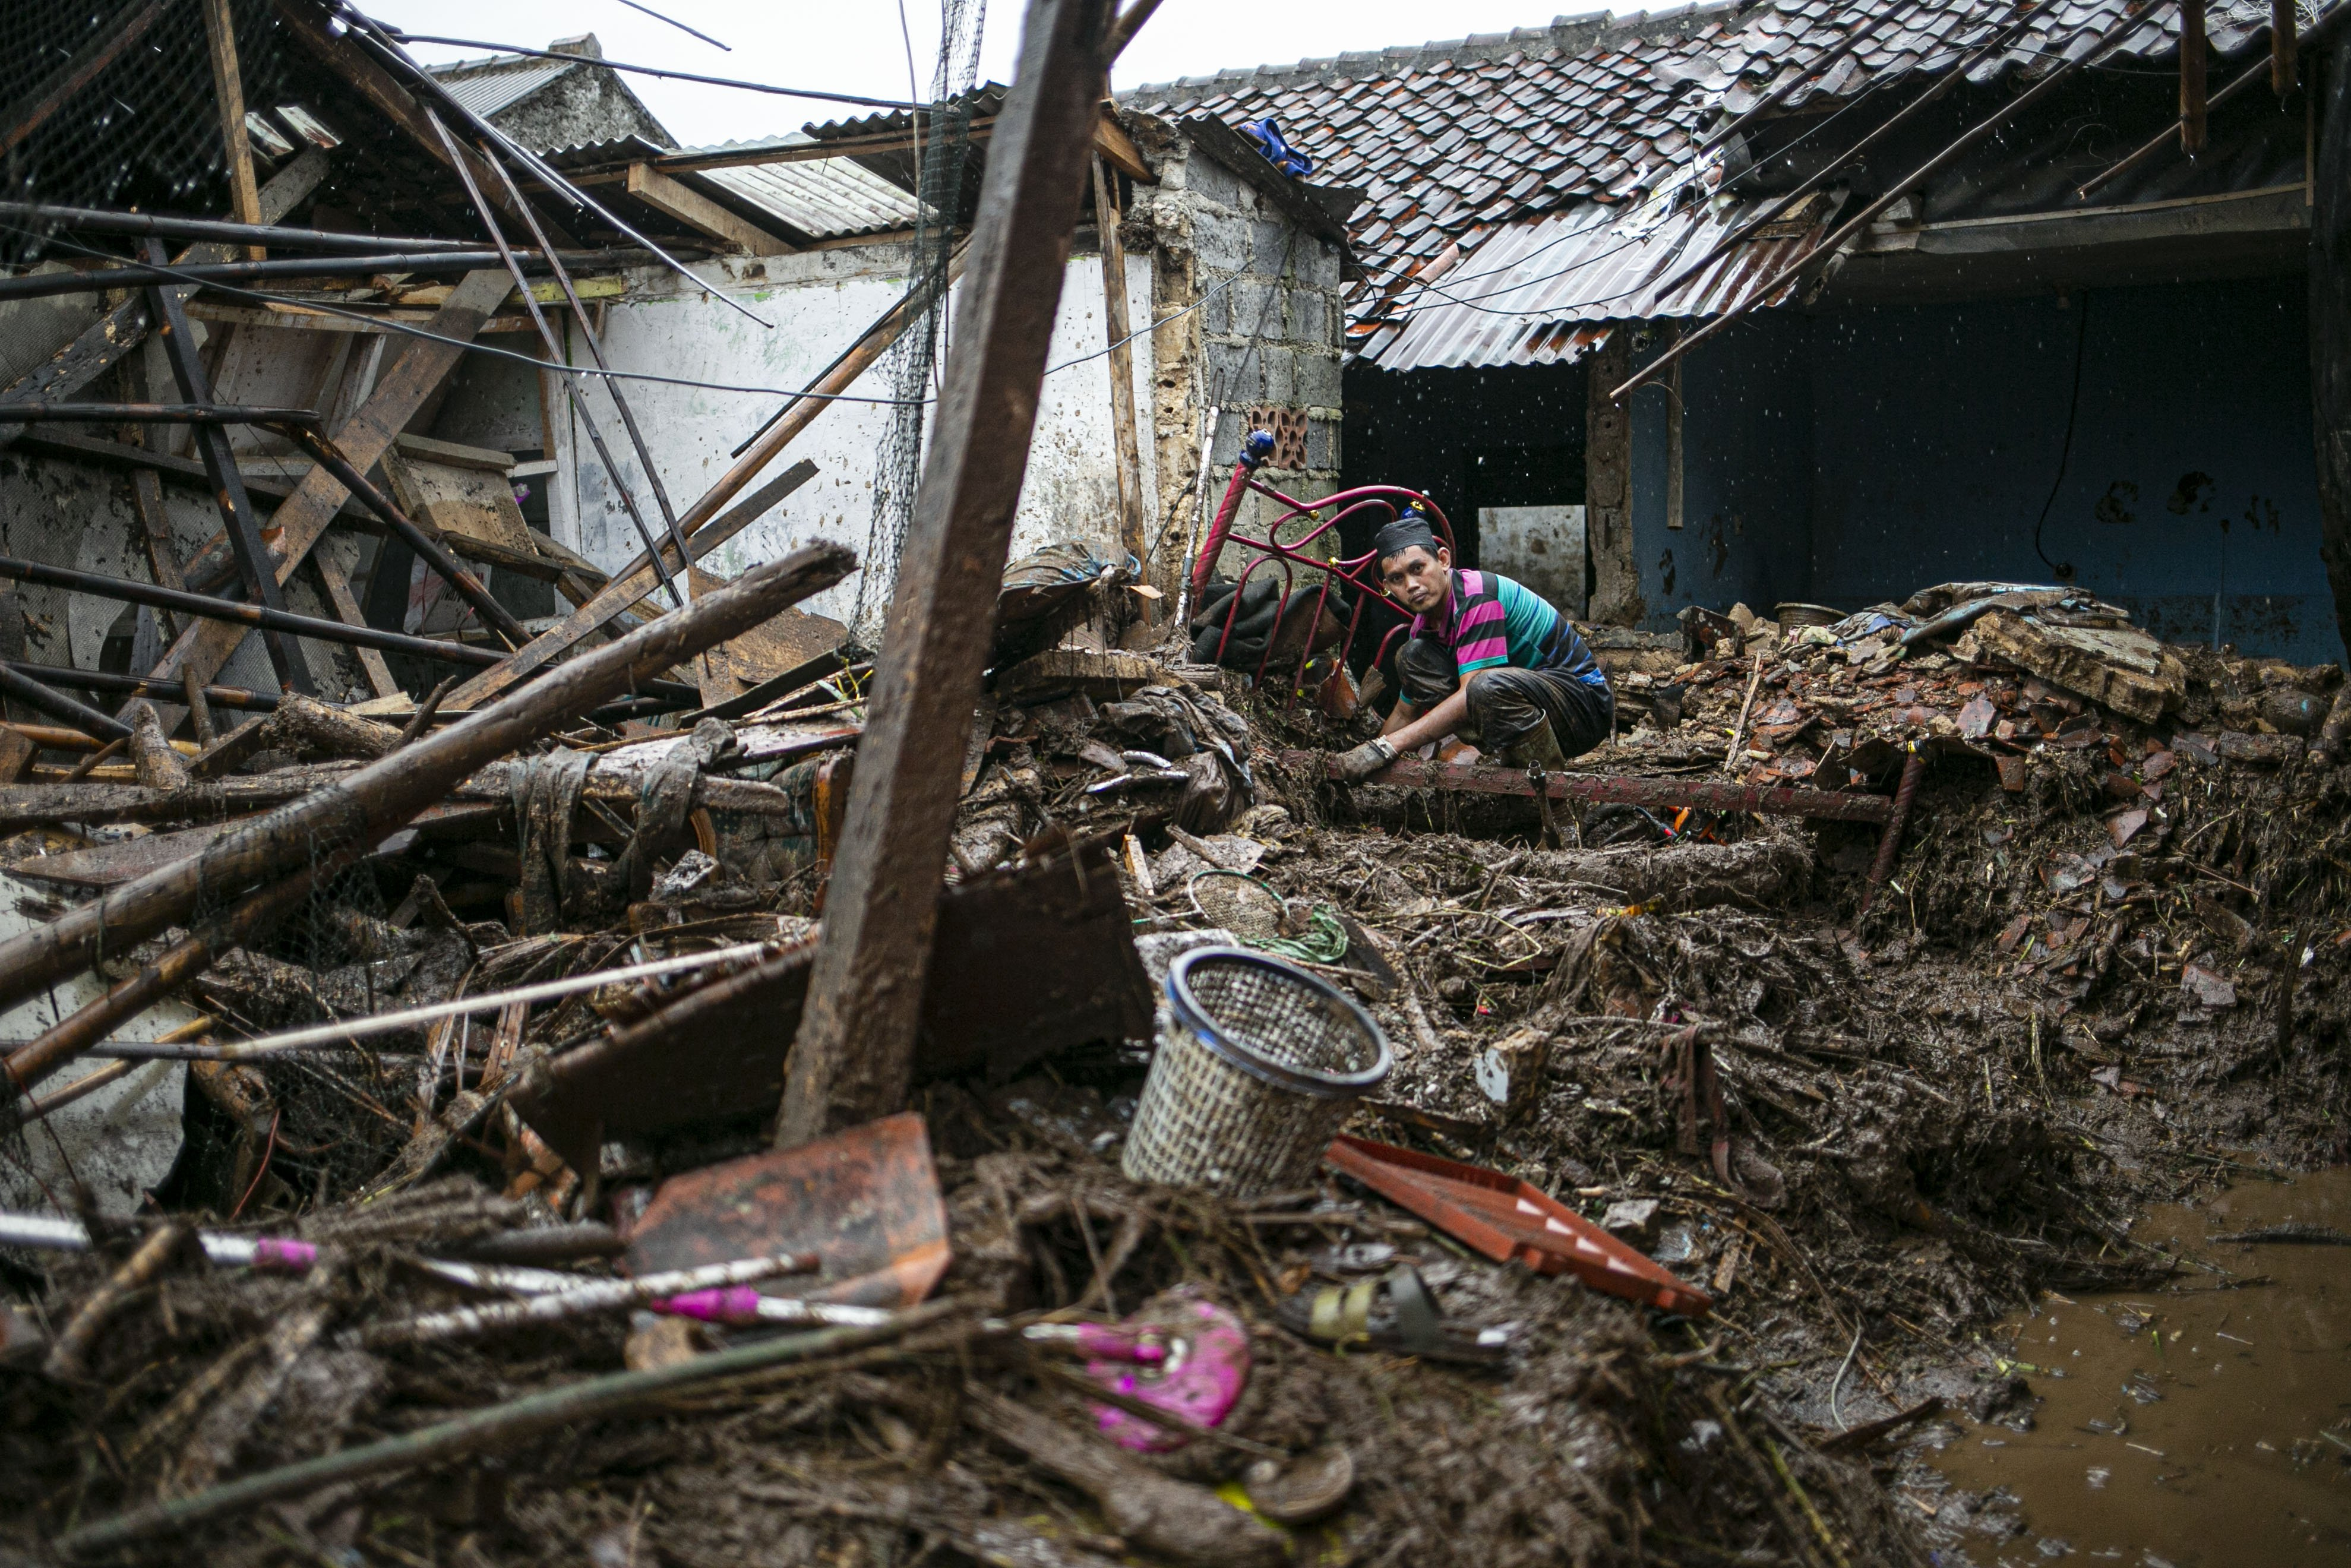 Warga mencari barang yang tersisa akibat banjir bandang di Kampung Cibuntu, Desa Pasawahan, Kecamatan Cicurug, Sukabumi, Jawa Barat, Selasa (22/9/2020). Data sementara yang dikeluarkan Badan Penanggulangan Bencana Daerah Kabupaten Sukabumi, Jawa Barat, dampak akibat banjir bandang yang terjadi di Kecamatan Cicurug, Senin (21/9), mengakibatkan 12 rumah hanyut dan 85 rumah terendam.